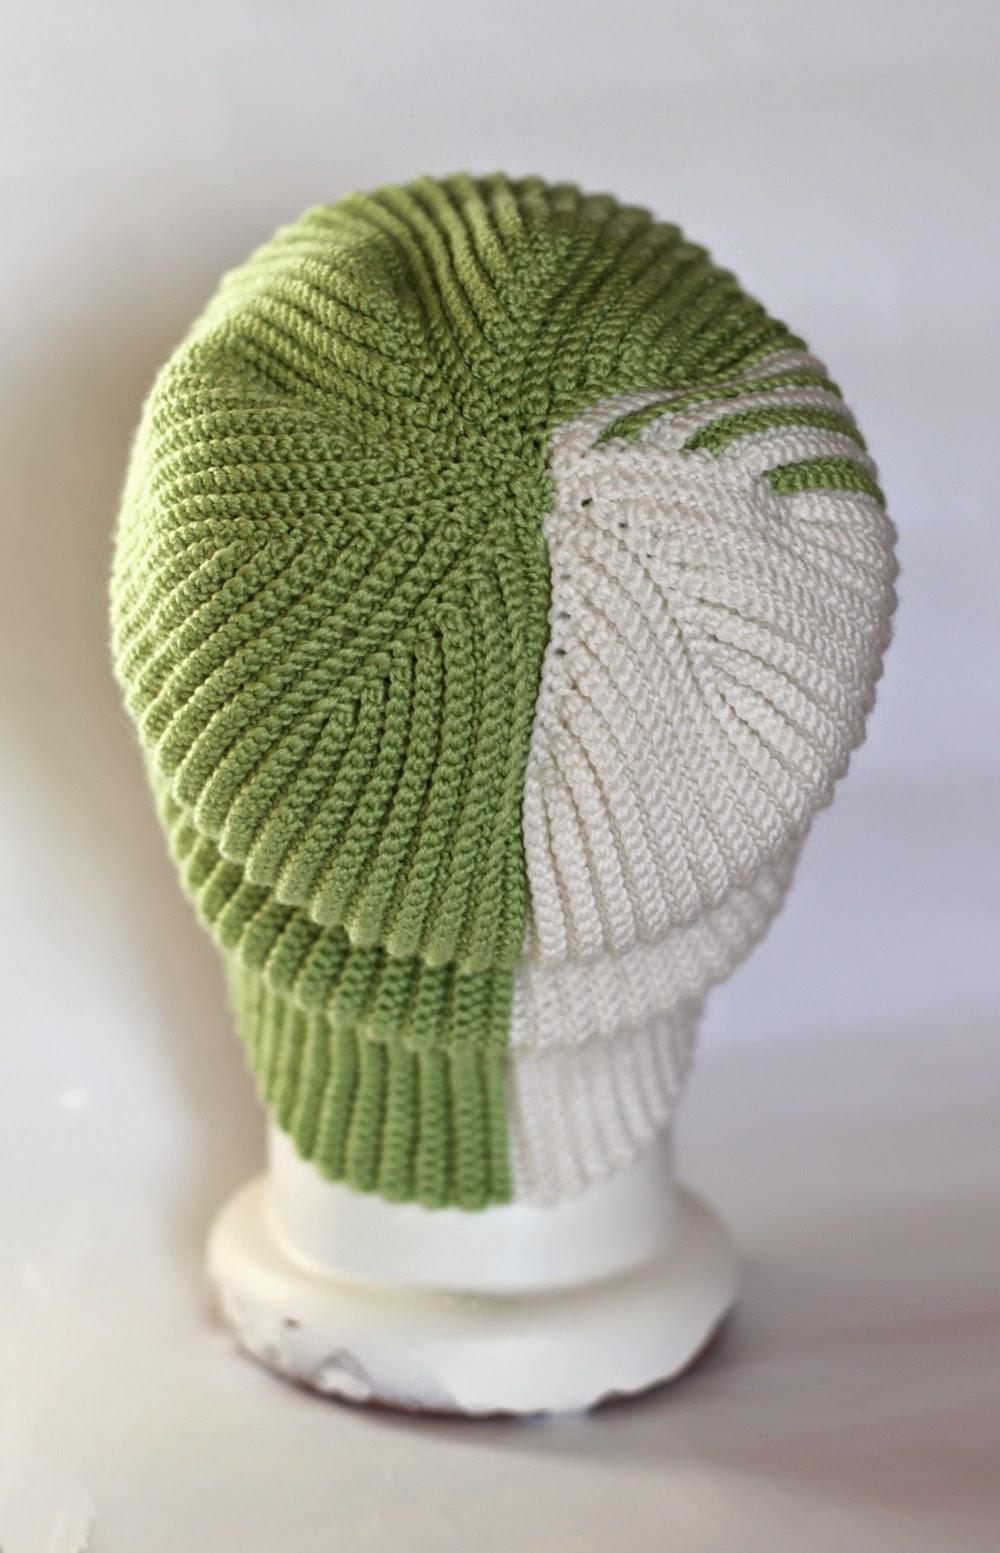 схема убавки для шапки резинкой